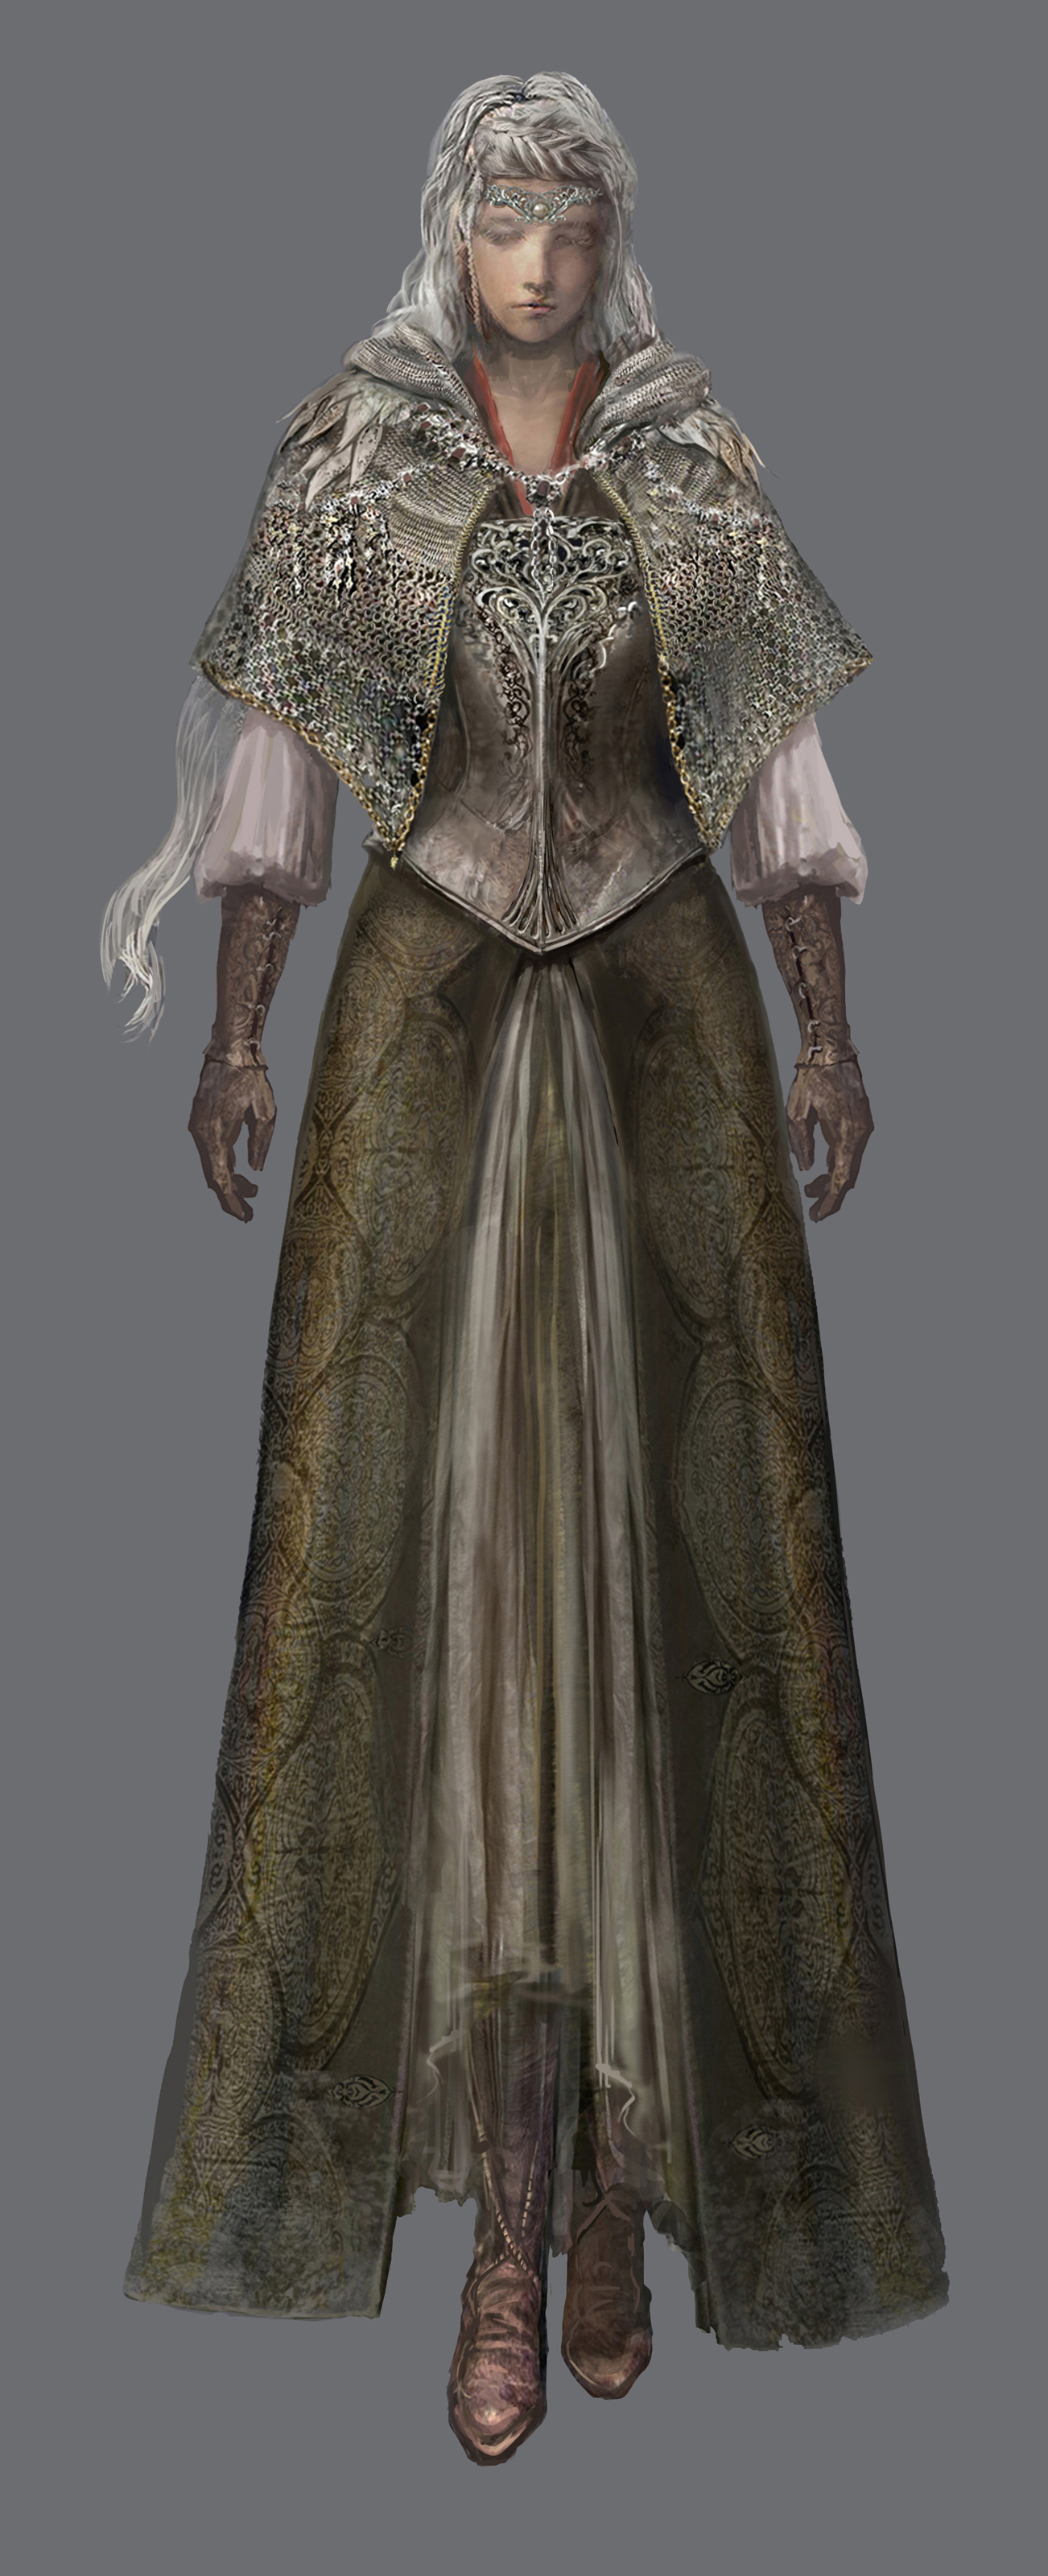 Dark Souls III - The Ringed City DLC gets more screenshots